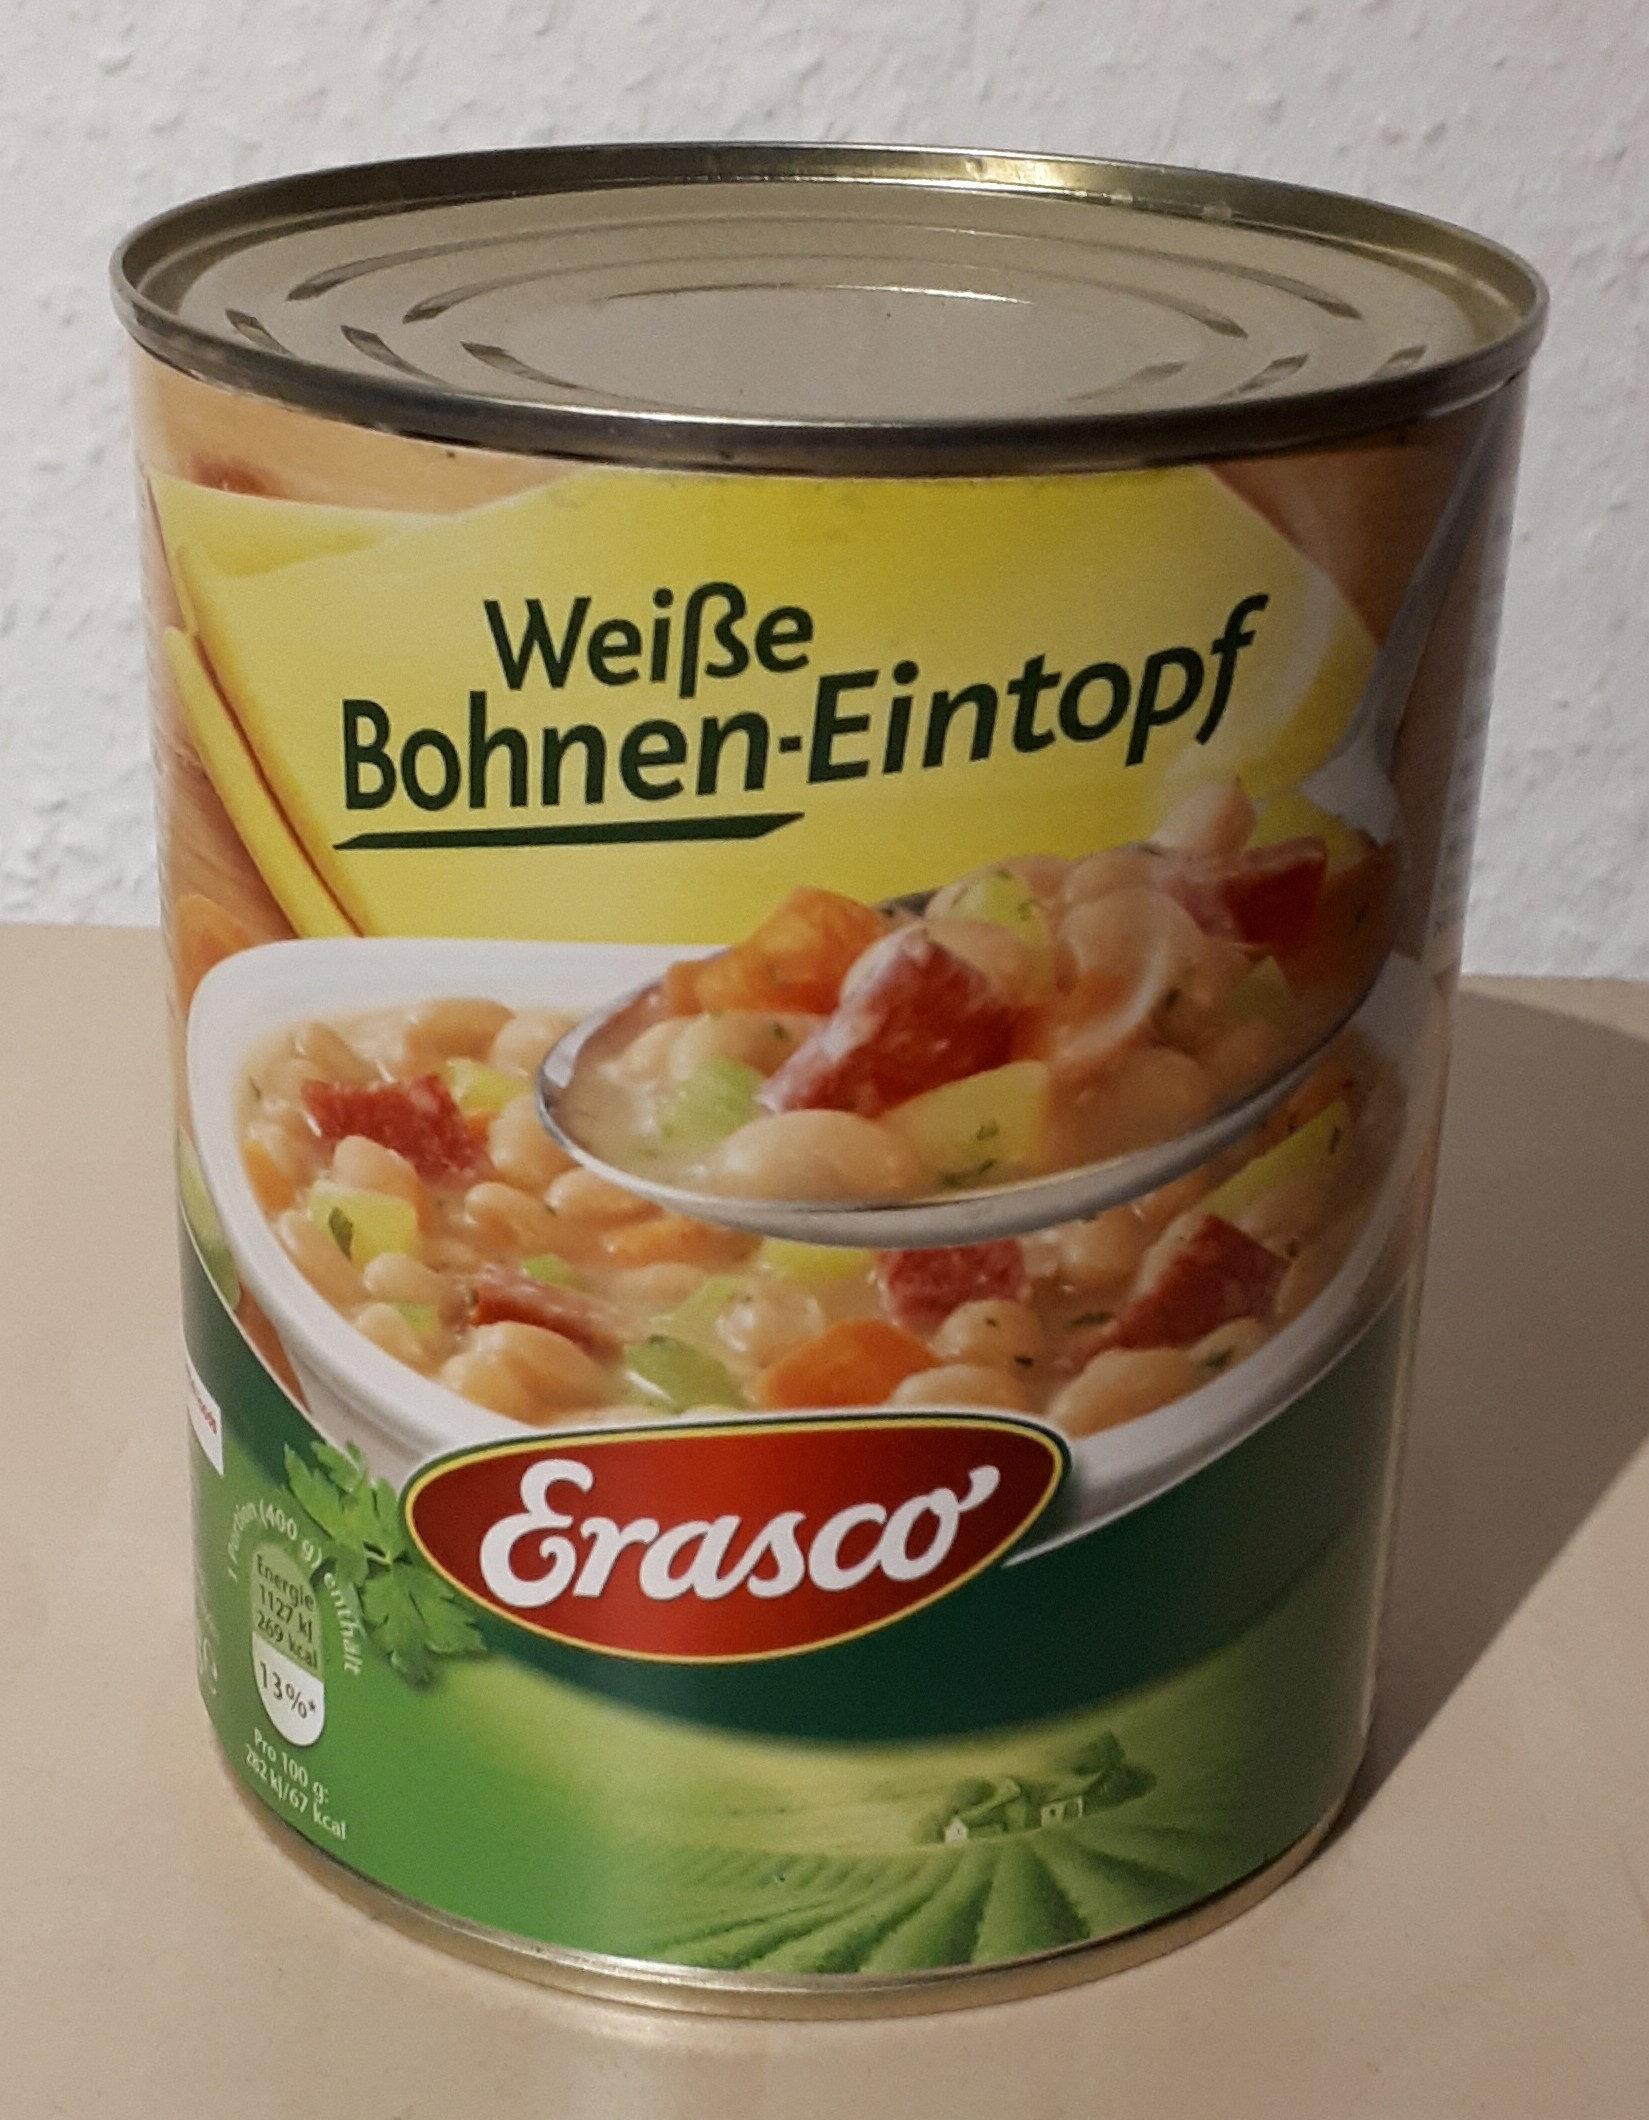 Weiße Bohnen-Eintopf - Produit - de